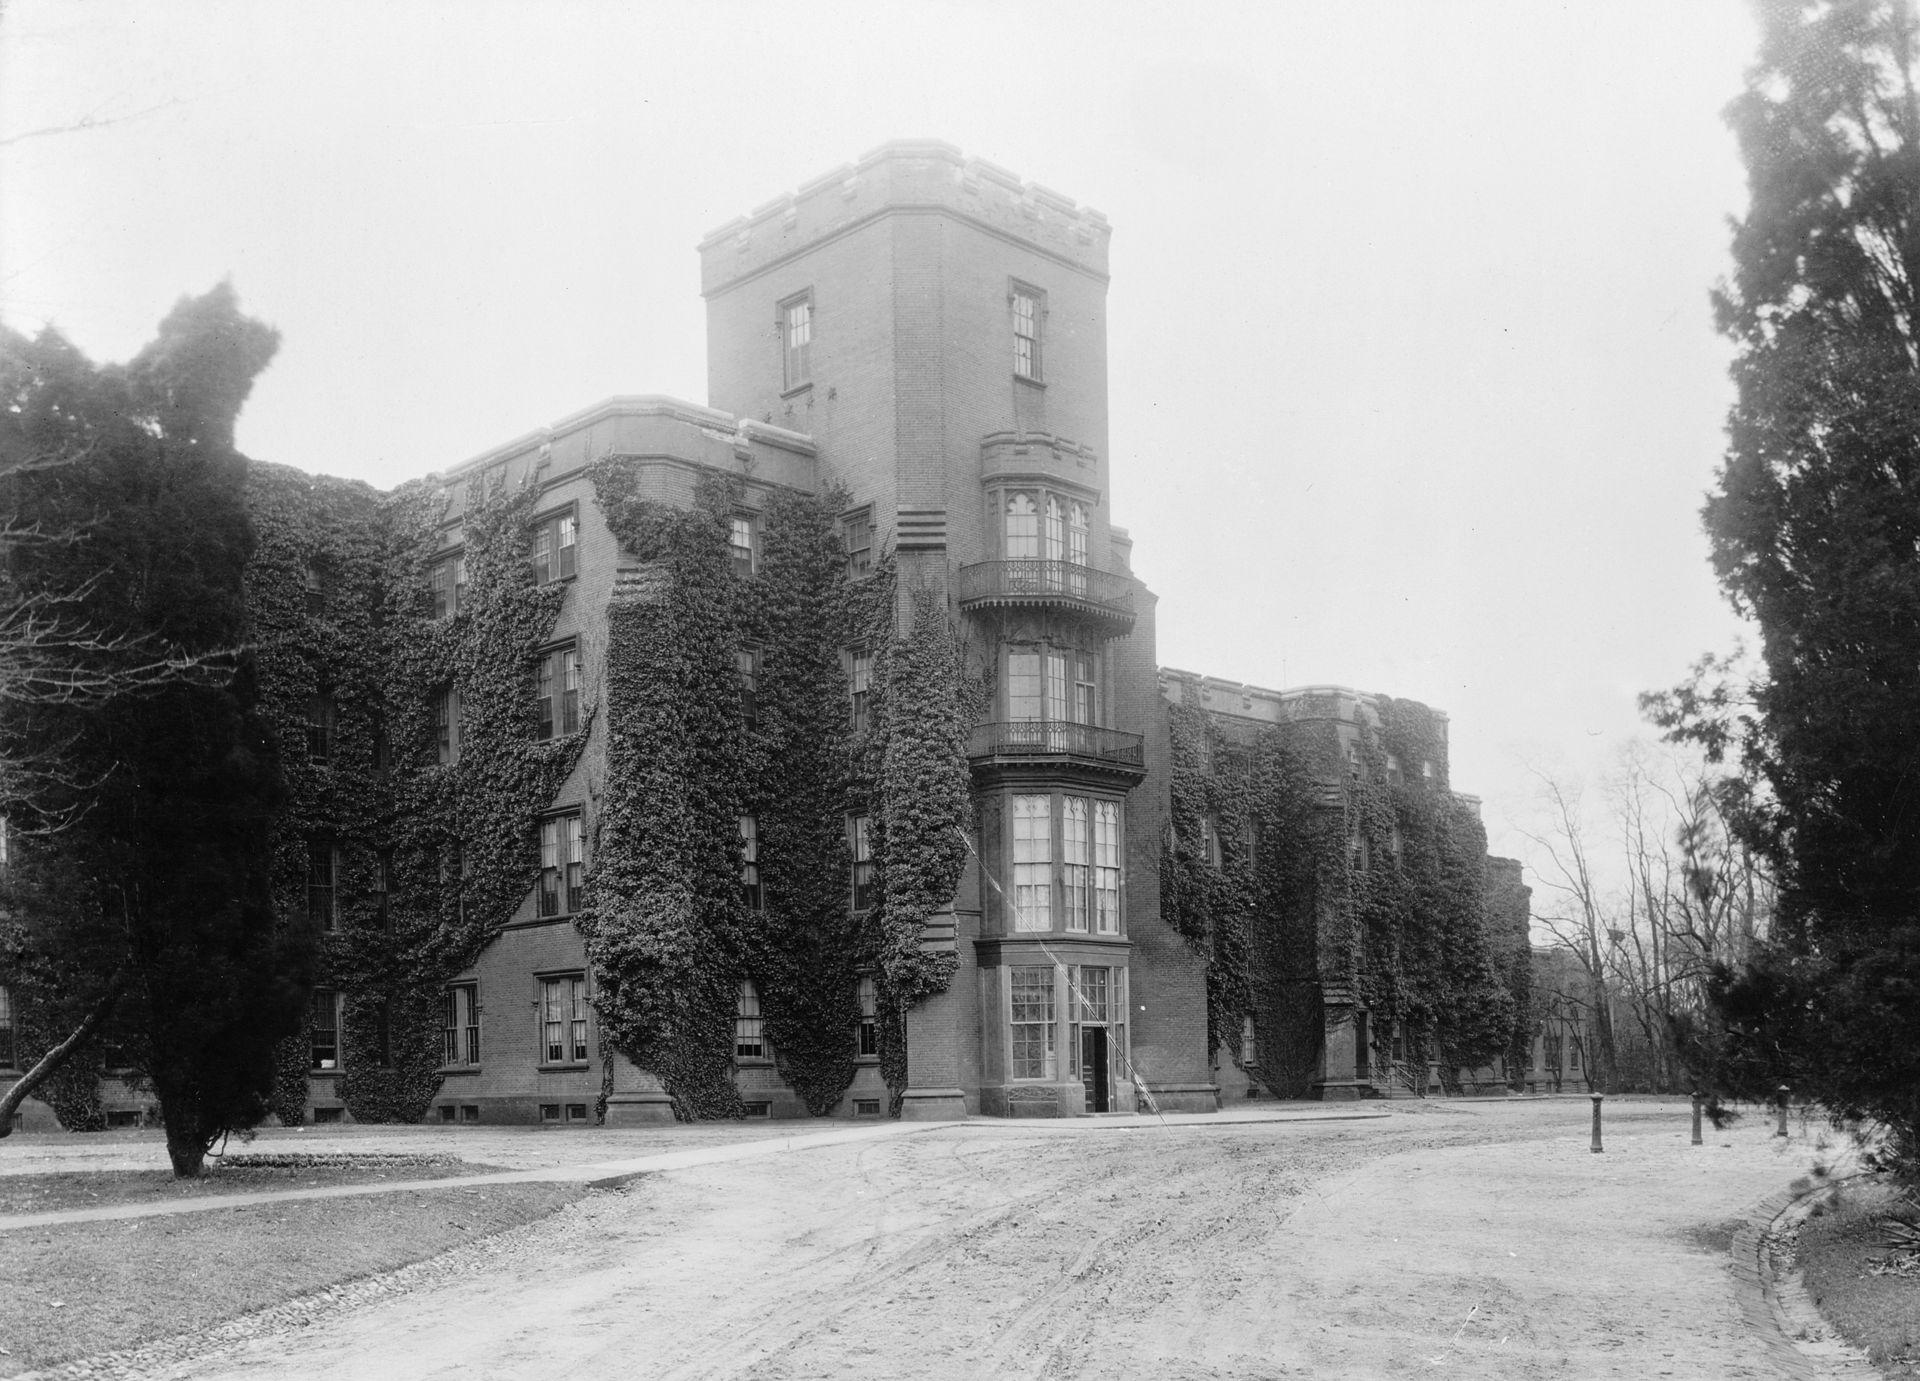 1920px-Center_building_at_Saint_Elizabeths,_National_Photo_Company,_circa_1909-1932